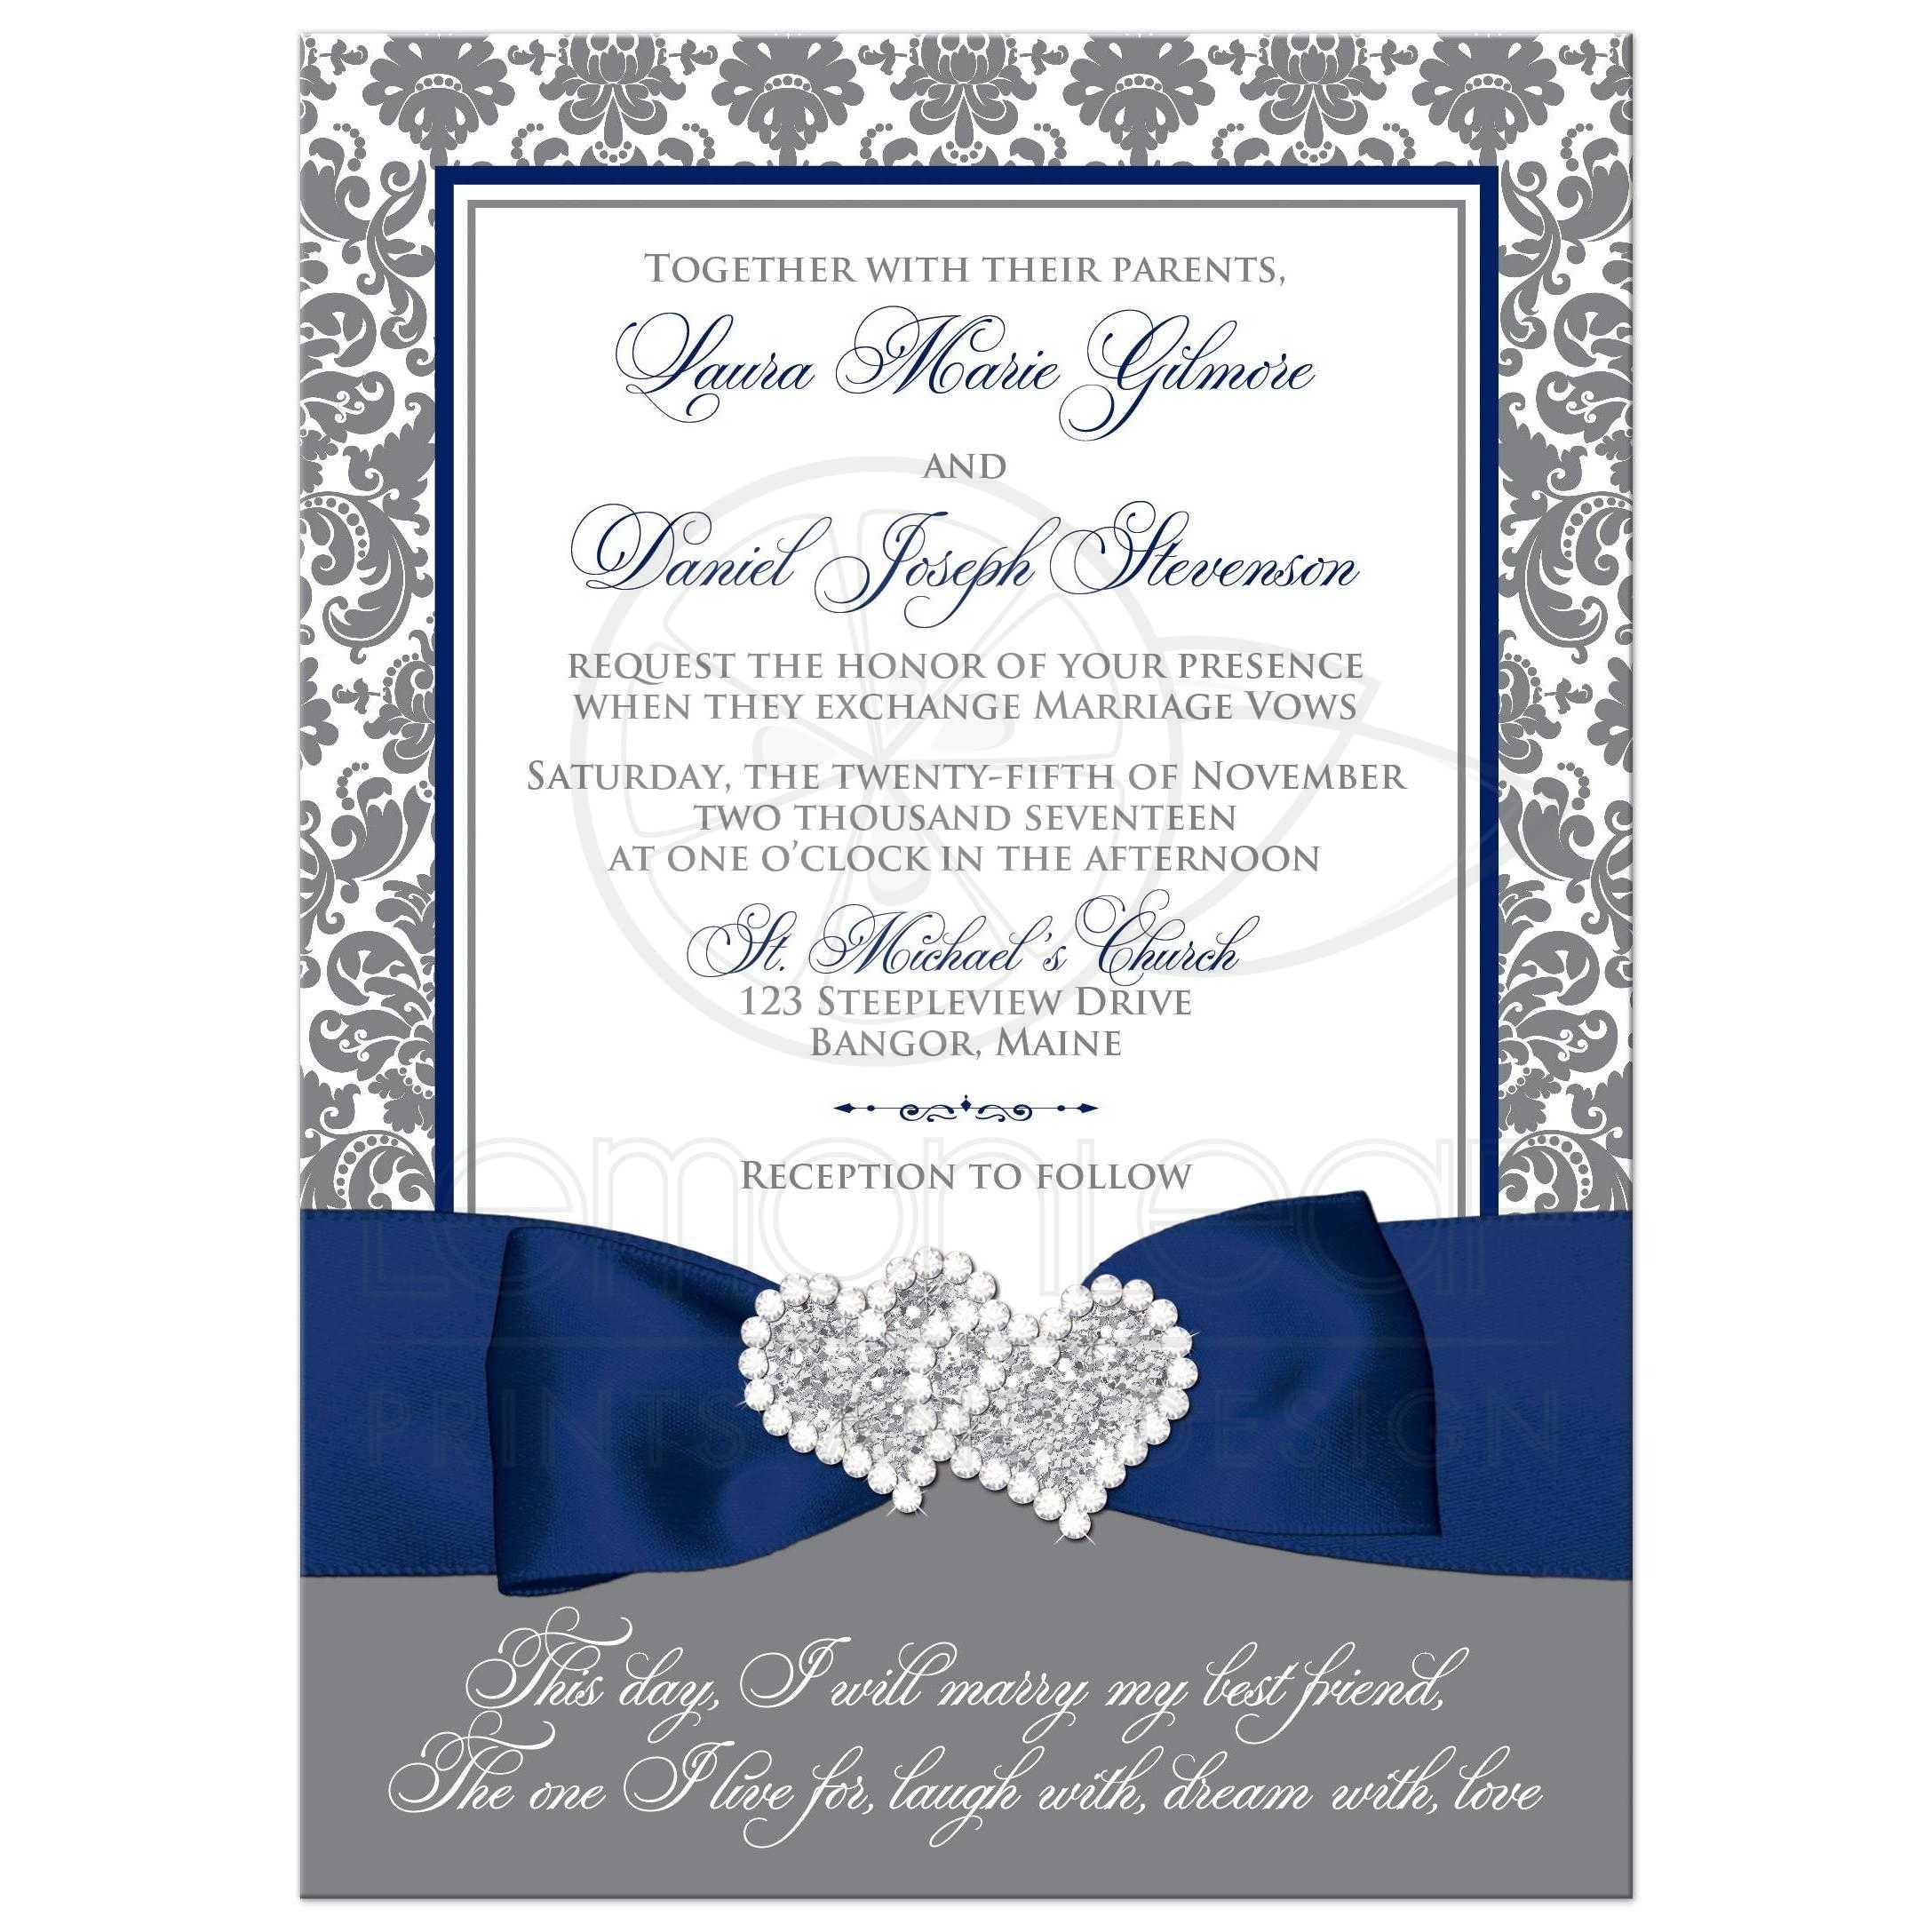 82 damask wedding invitations Gold Damask Scroll Bright White Wedding Invitations